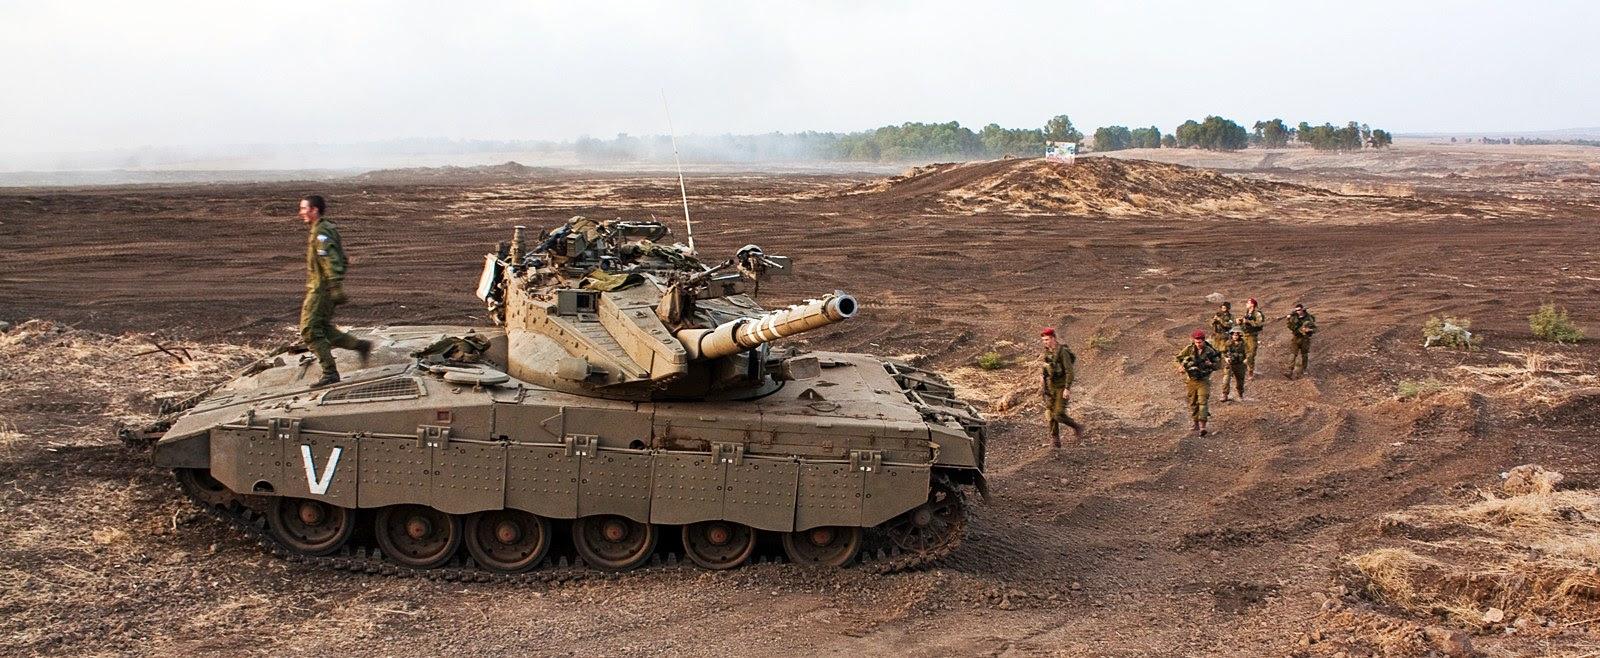 Resultado de imagem para tanque merkava líbano